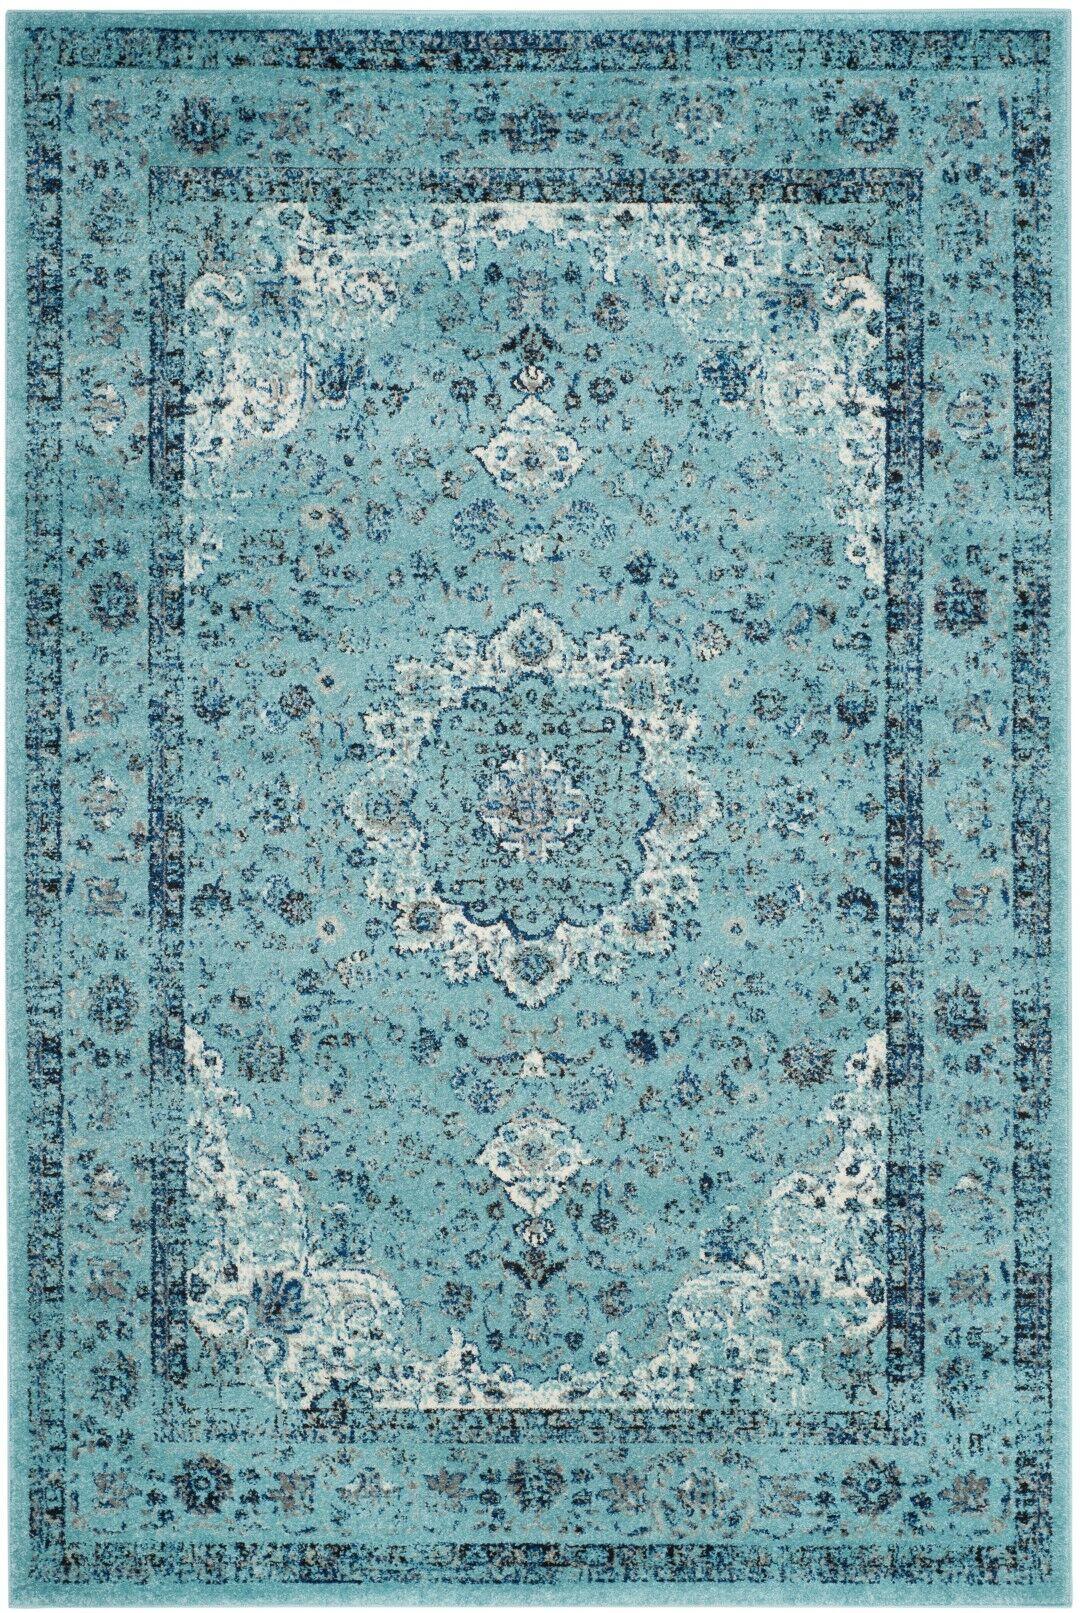 Centralia Light Blue Area Rug Rug Size: Rectangle 9' x 12'